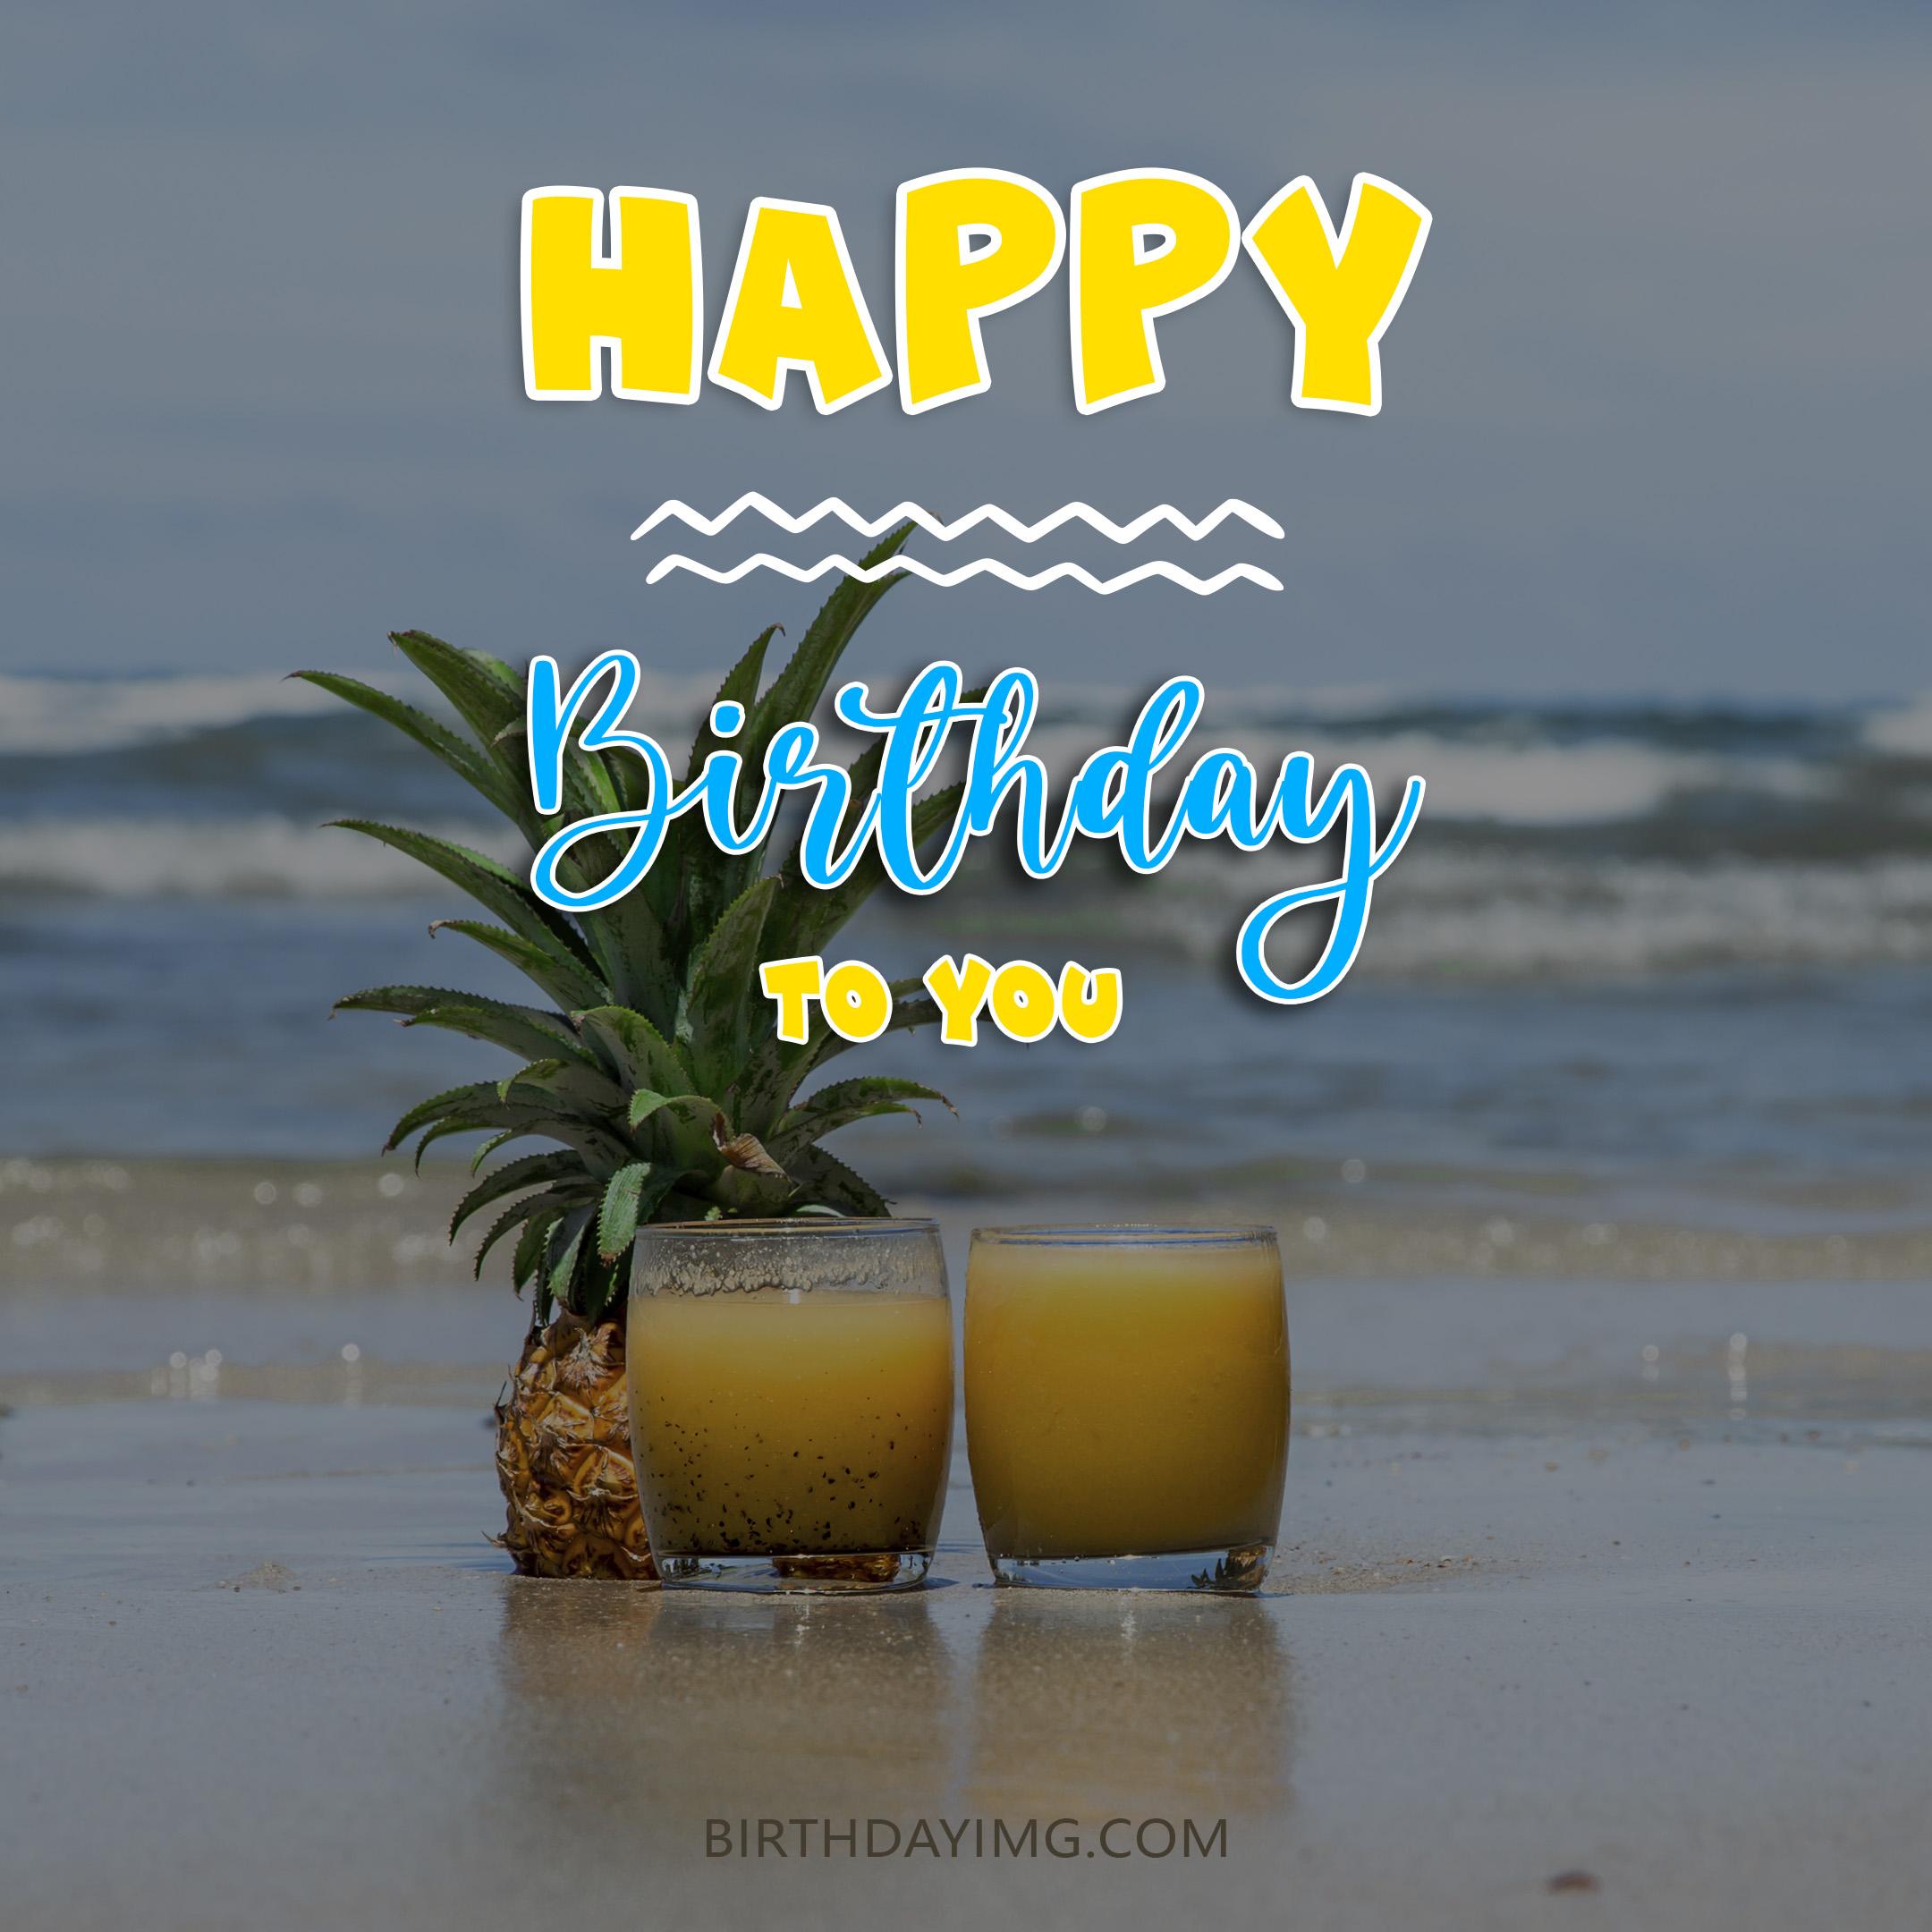 Free Happy Birthday Image With Beach and Drinks - birthdayimg.com